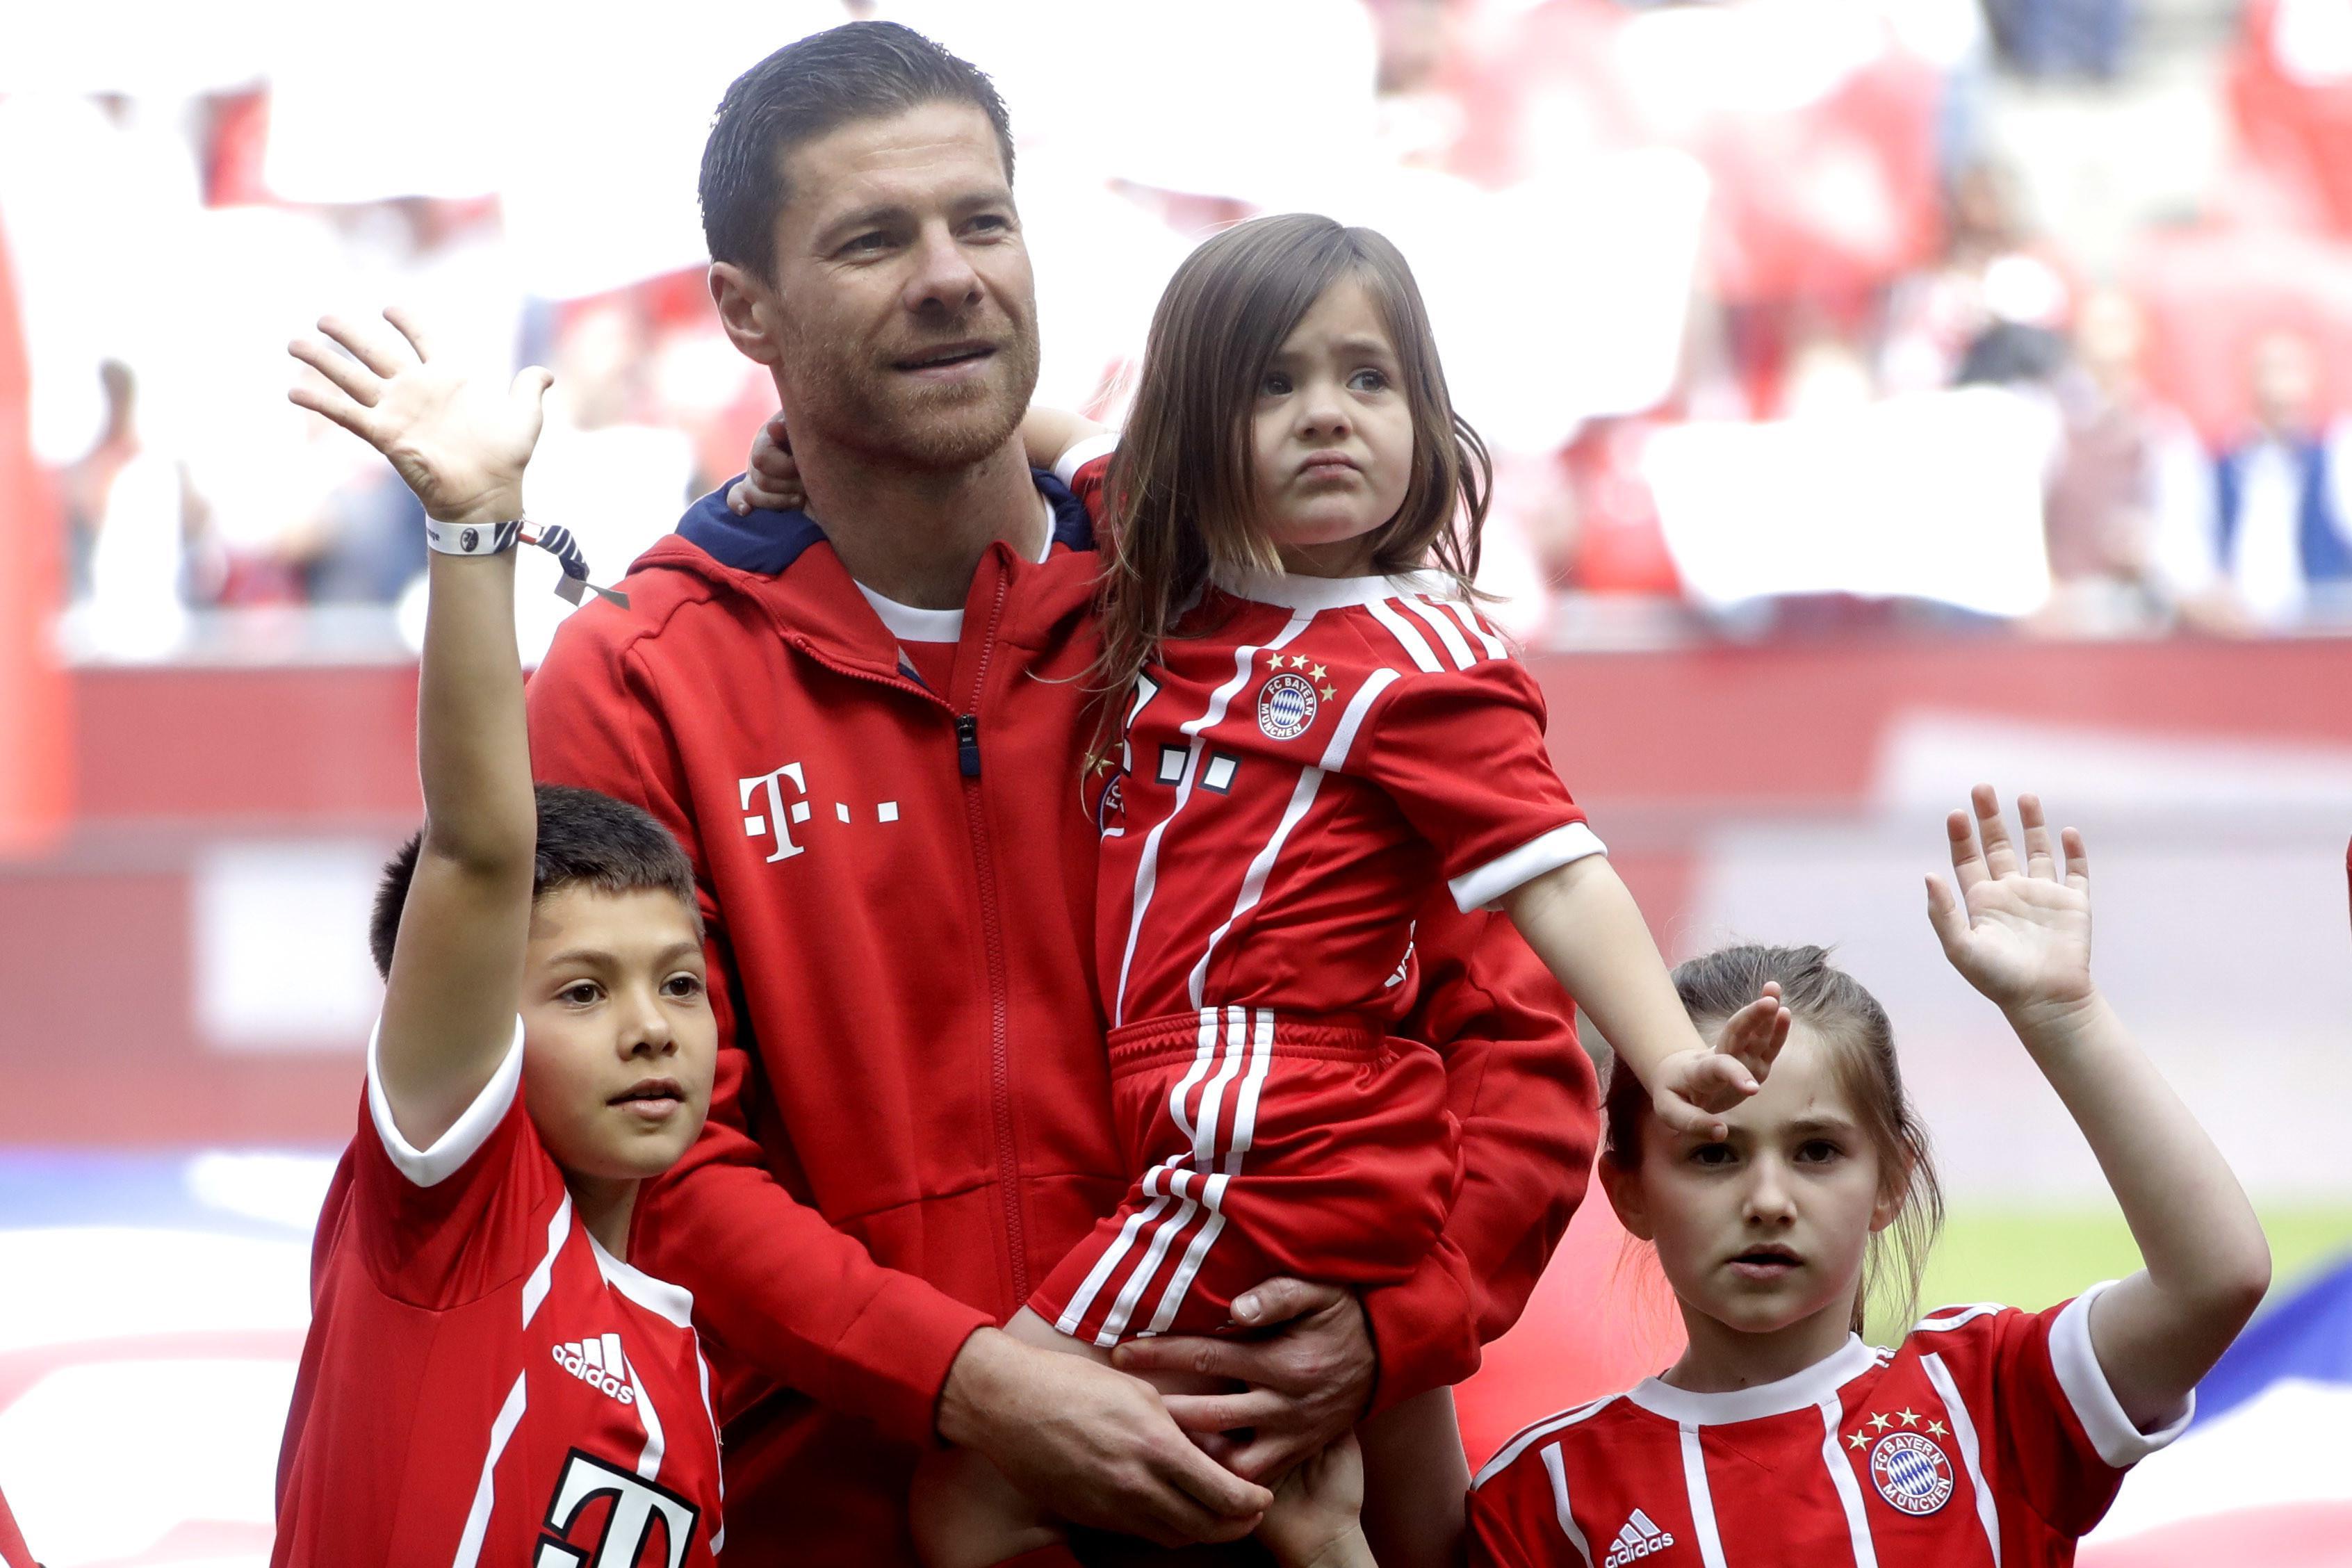 Gelandang Bayern Muenchen, Xabi Alonso, berpose bersama ketiga anaknya sebelum melakoni laga terakhir di sepak bola. Alonso dan Philipp Lahm gantung sepatu usai laga melawan Freiburg, Sabtu (20/5/2017). (AP Photo/Matthias Schrader)